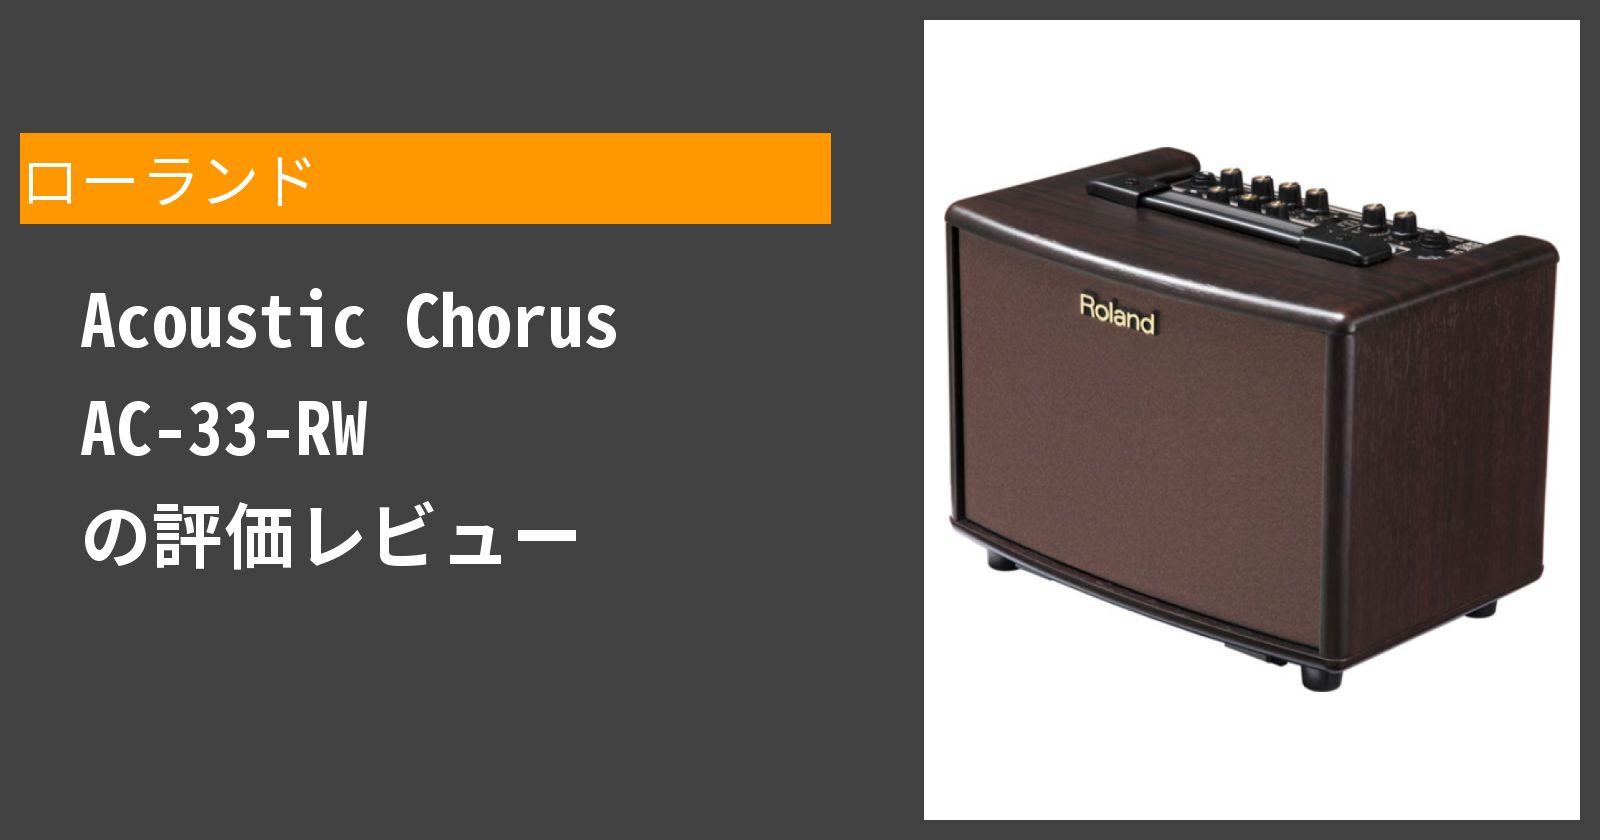 Acoustic Chorus AC-33-RWを徹底評価